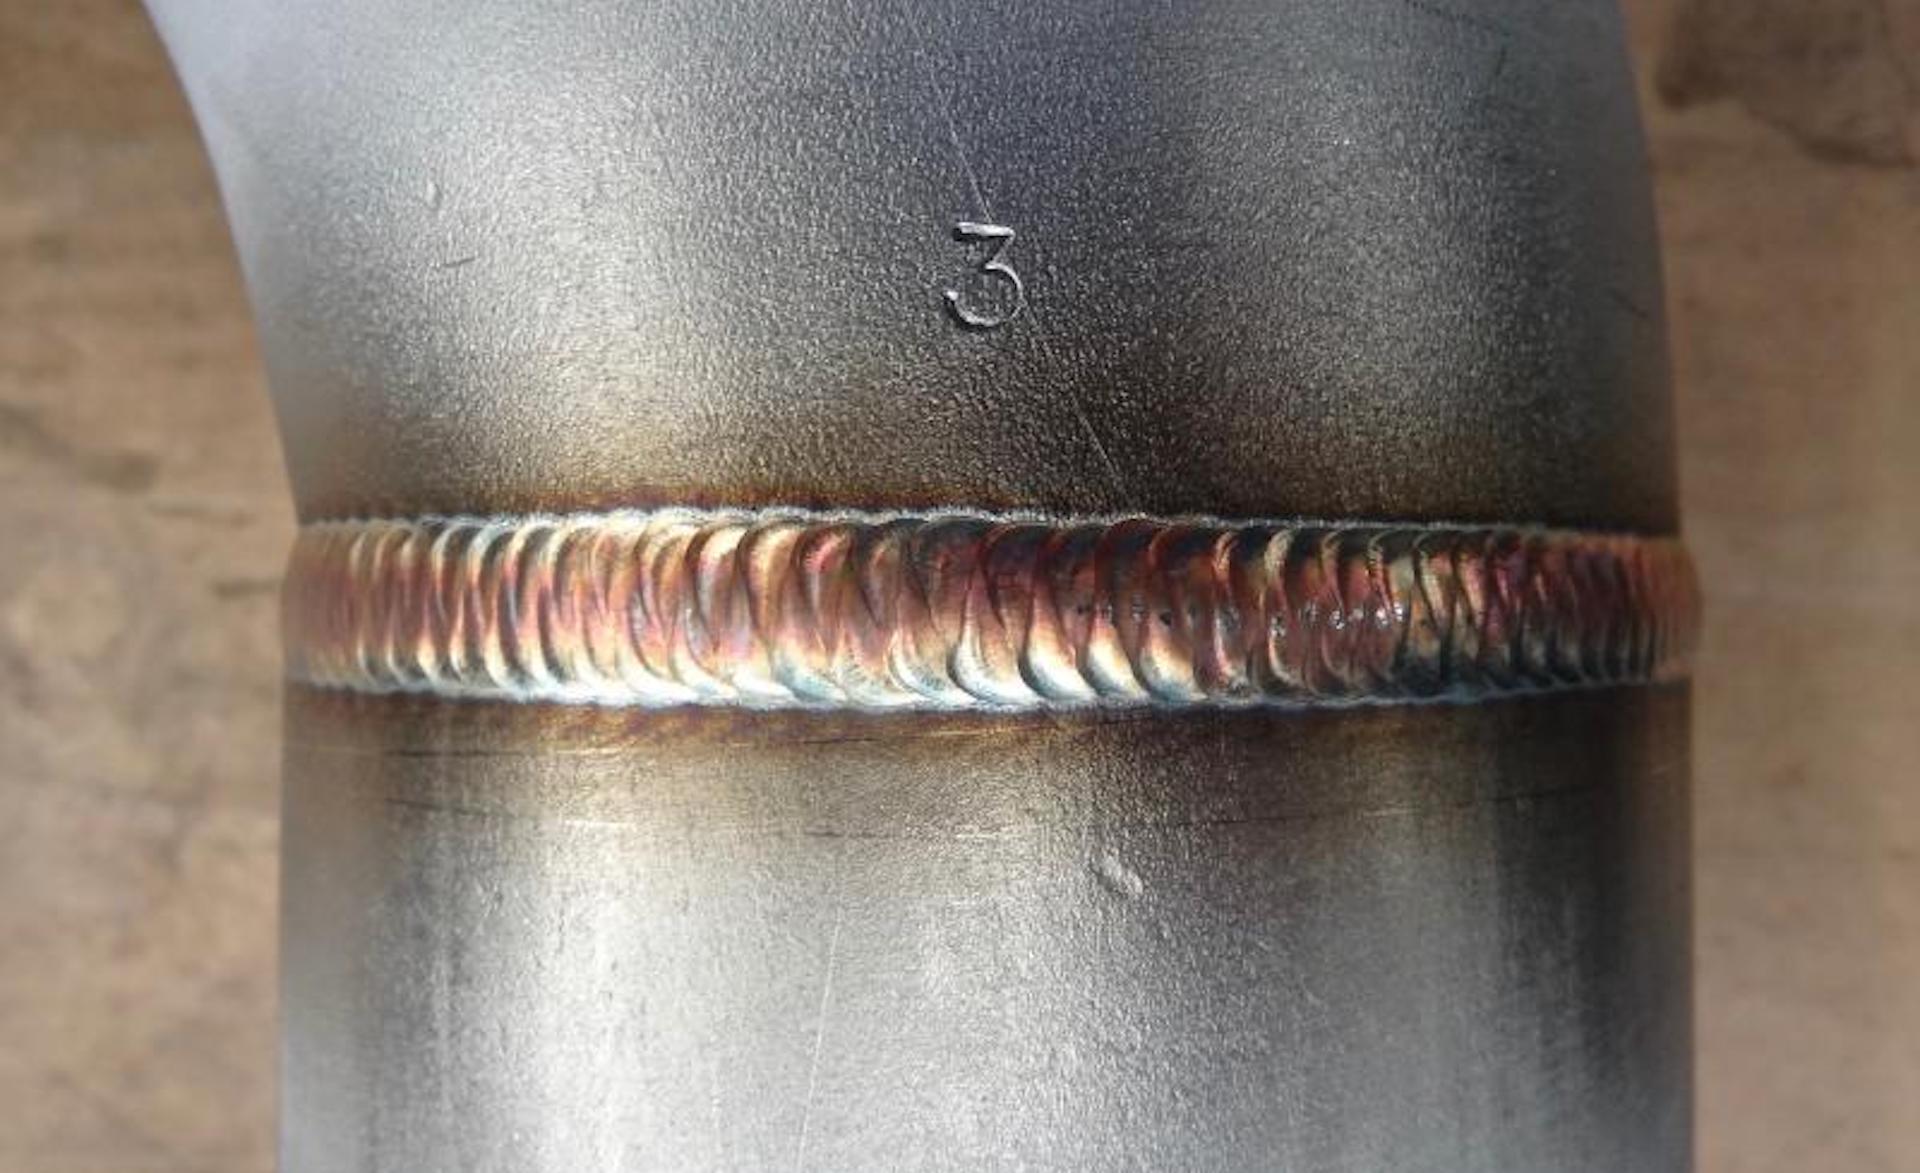 full penetration butt weld on a 4 pipe